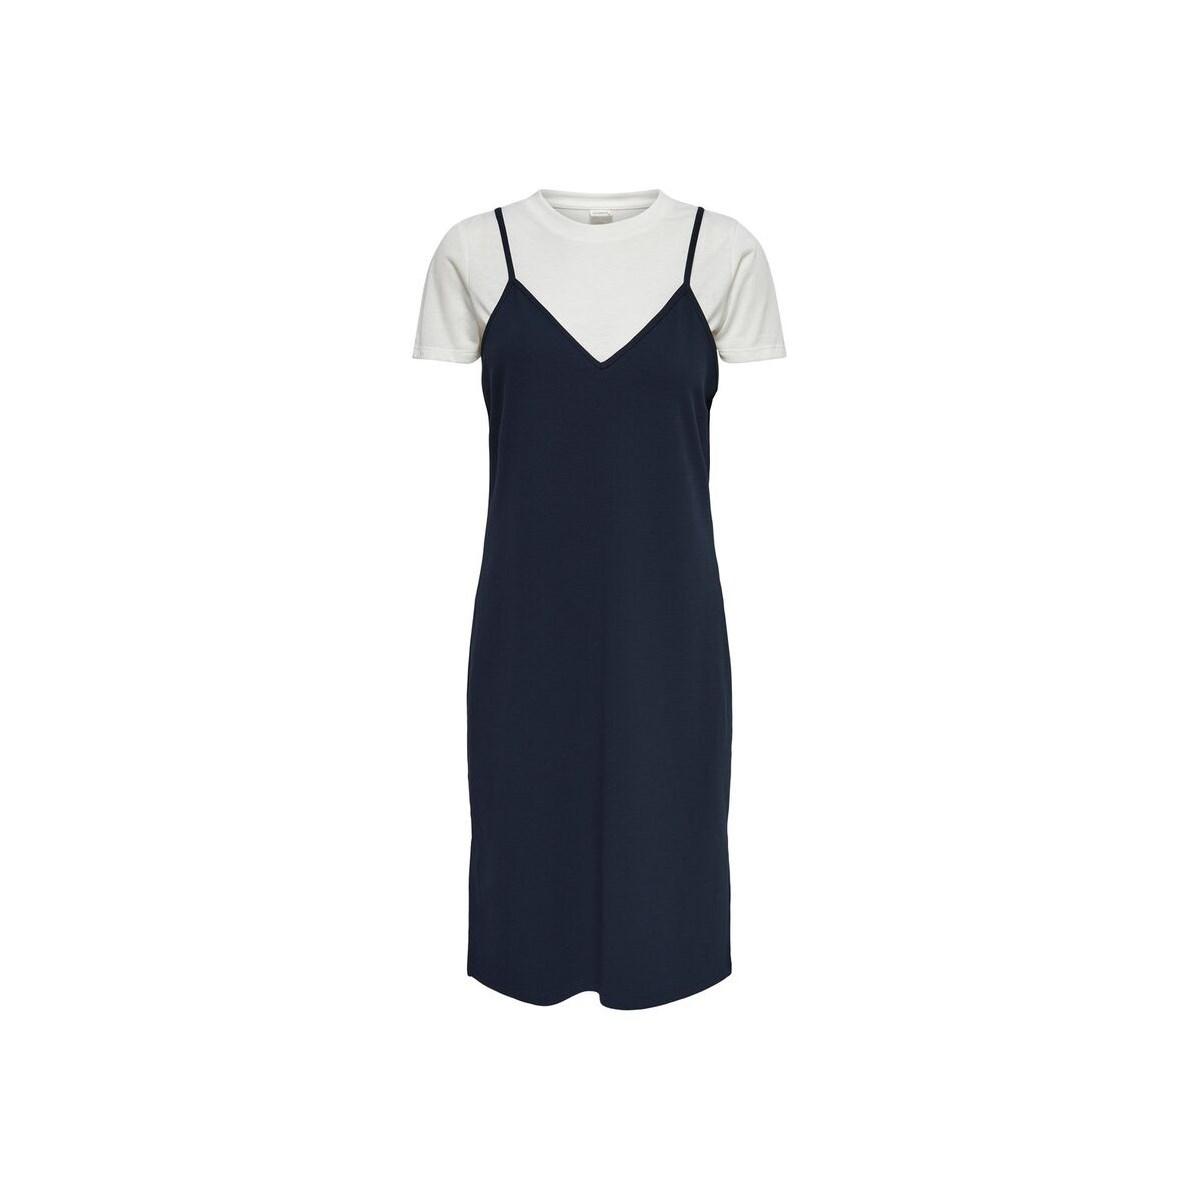 Jdydiana S/s Slip Dress Jrs